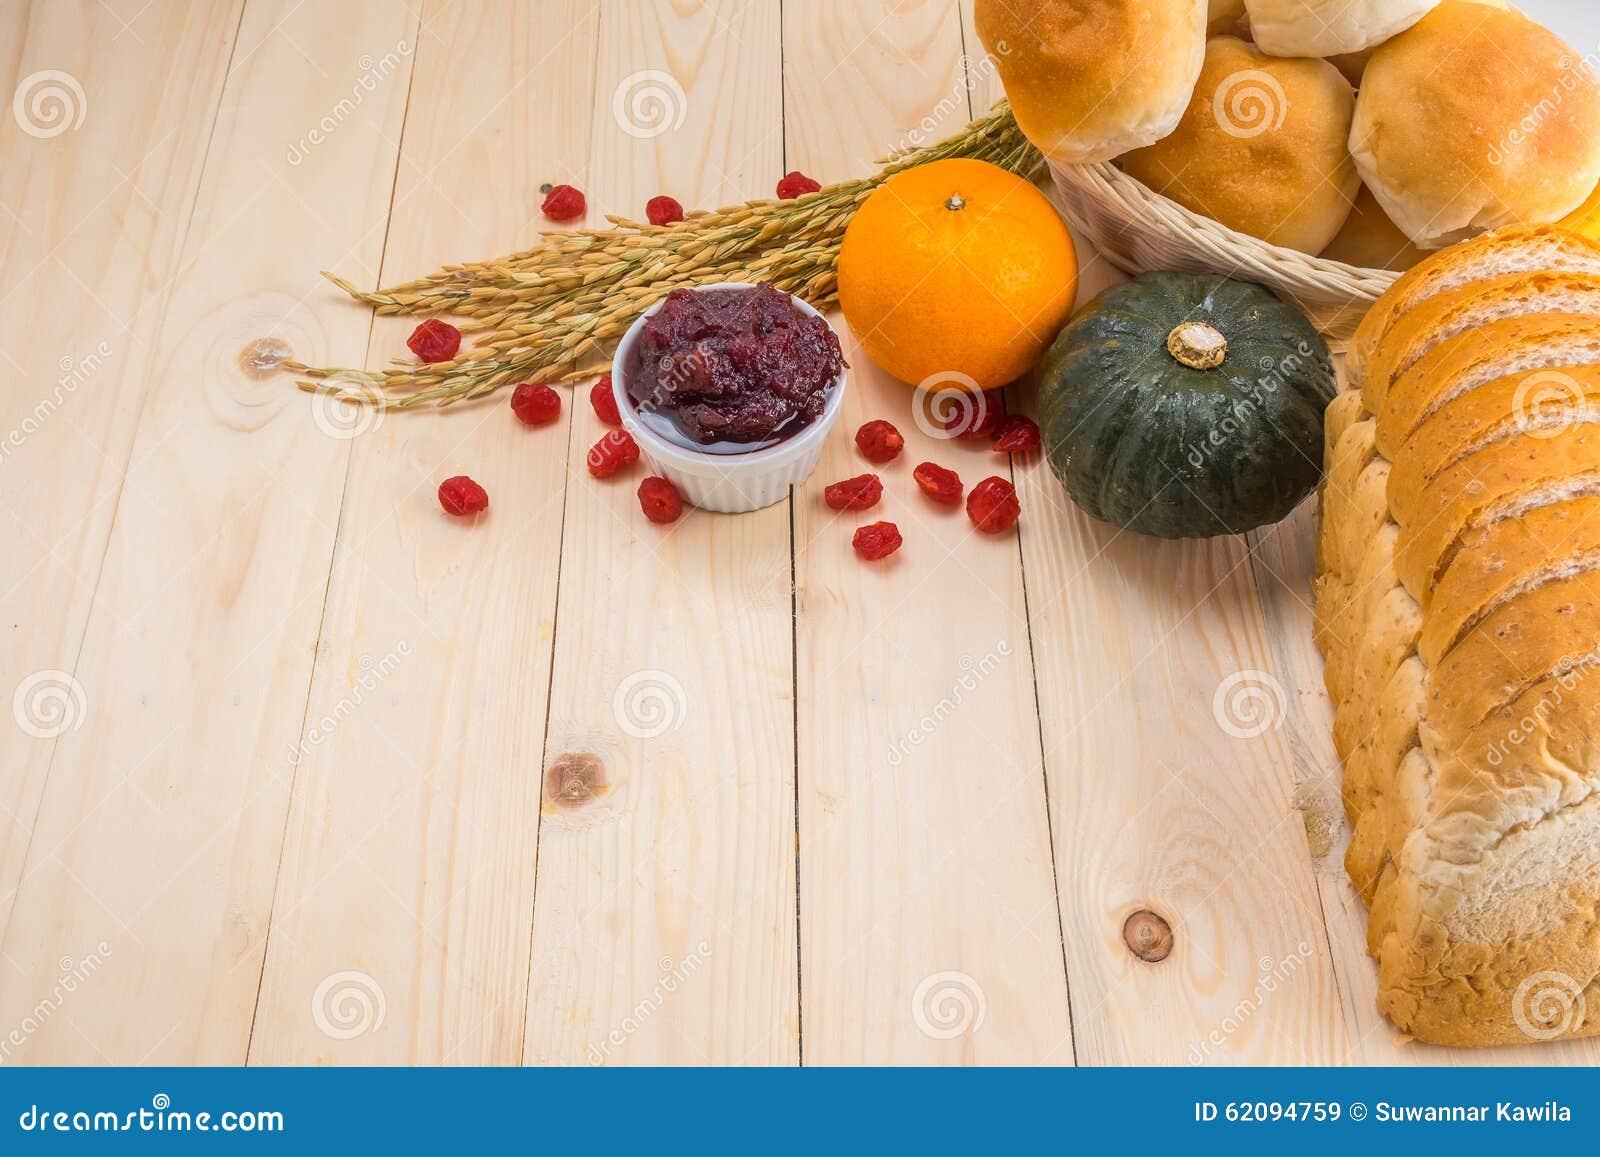 Happy Thanksgiving - Autumn fruit for Thanksgiving.